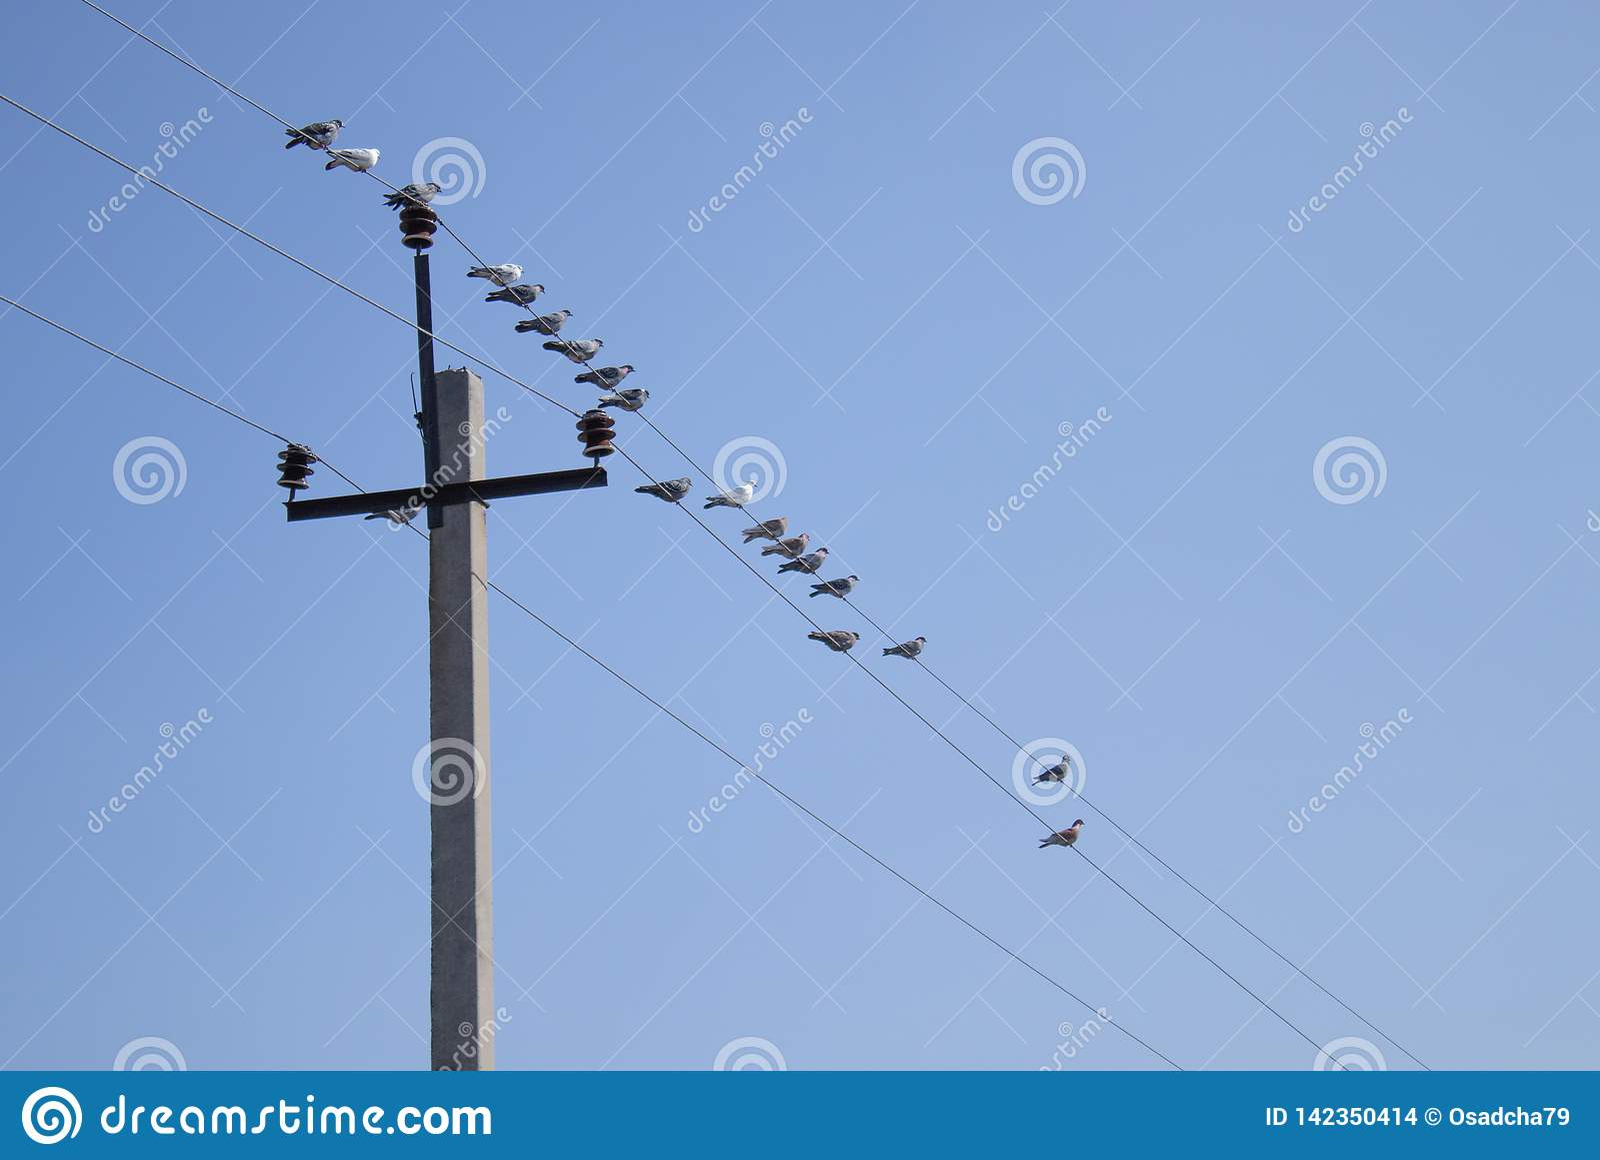 Birds Are Sitting On Wires Near The Pillar Stock Photo ... on